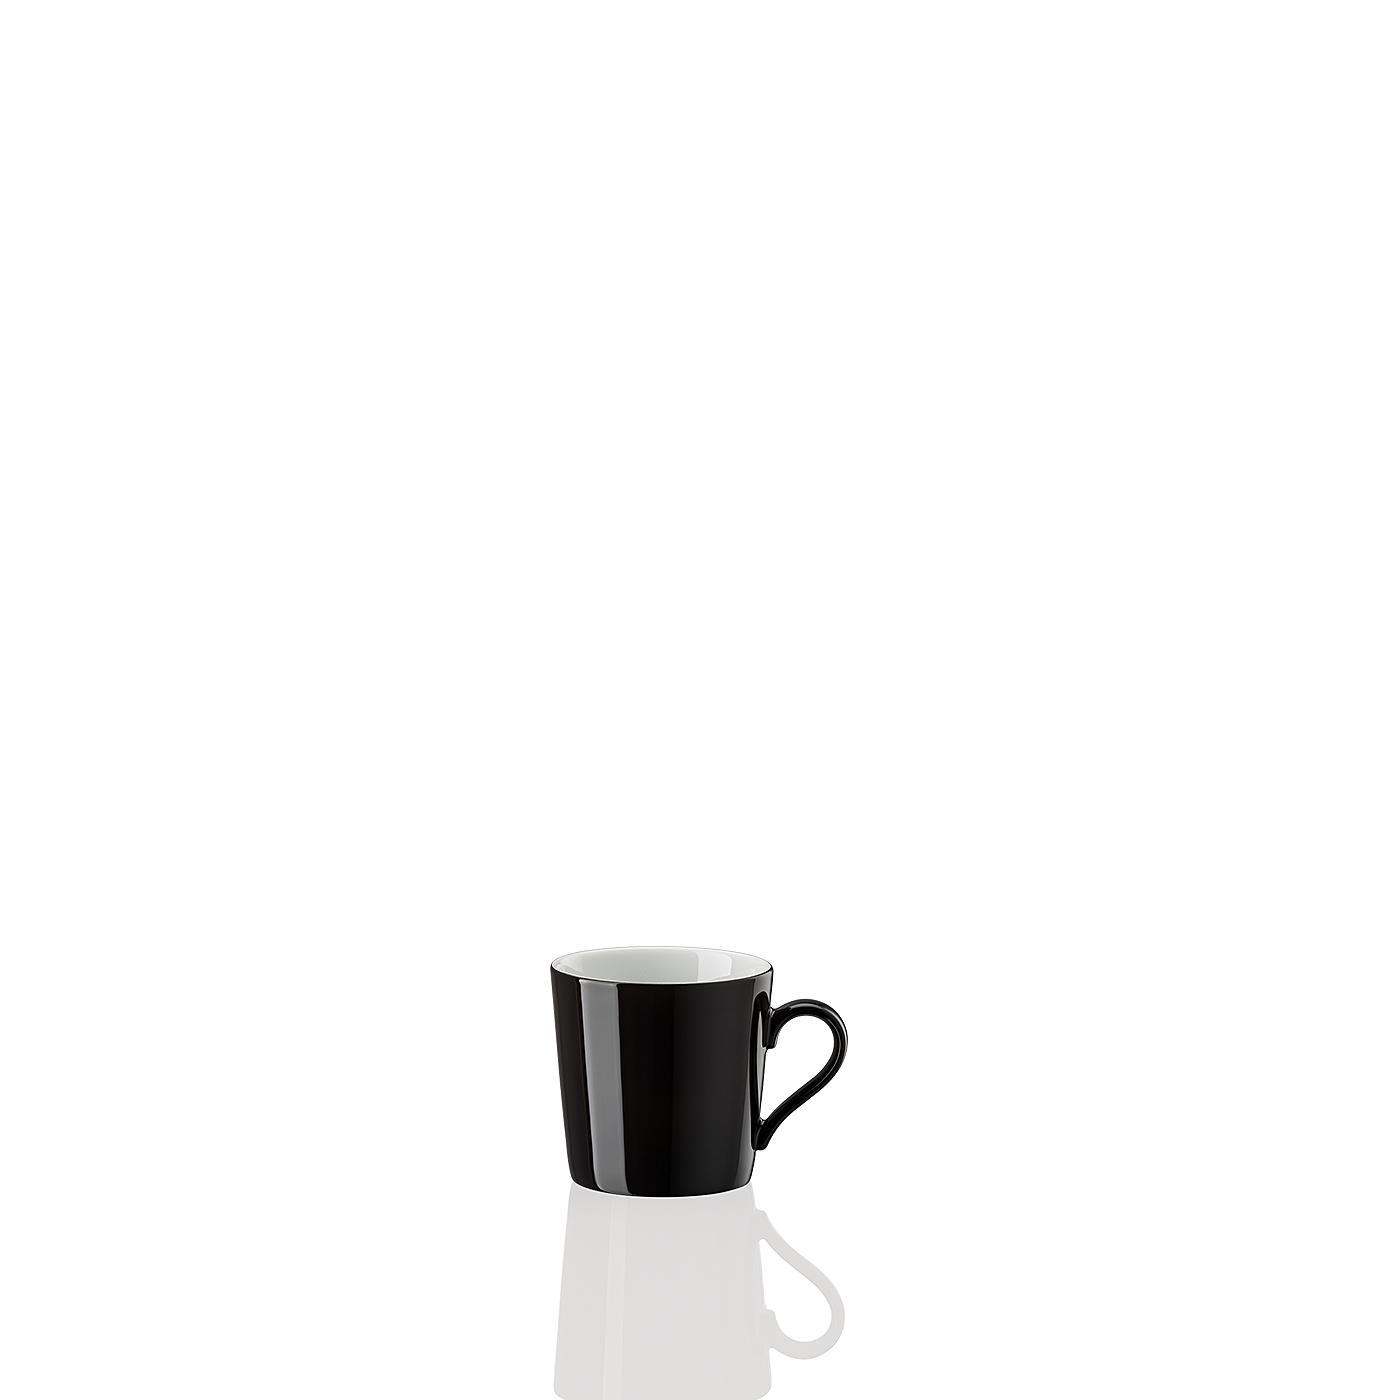 Espresso-/Mokka-Obertasse Tric Monochrome Arzberg